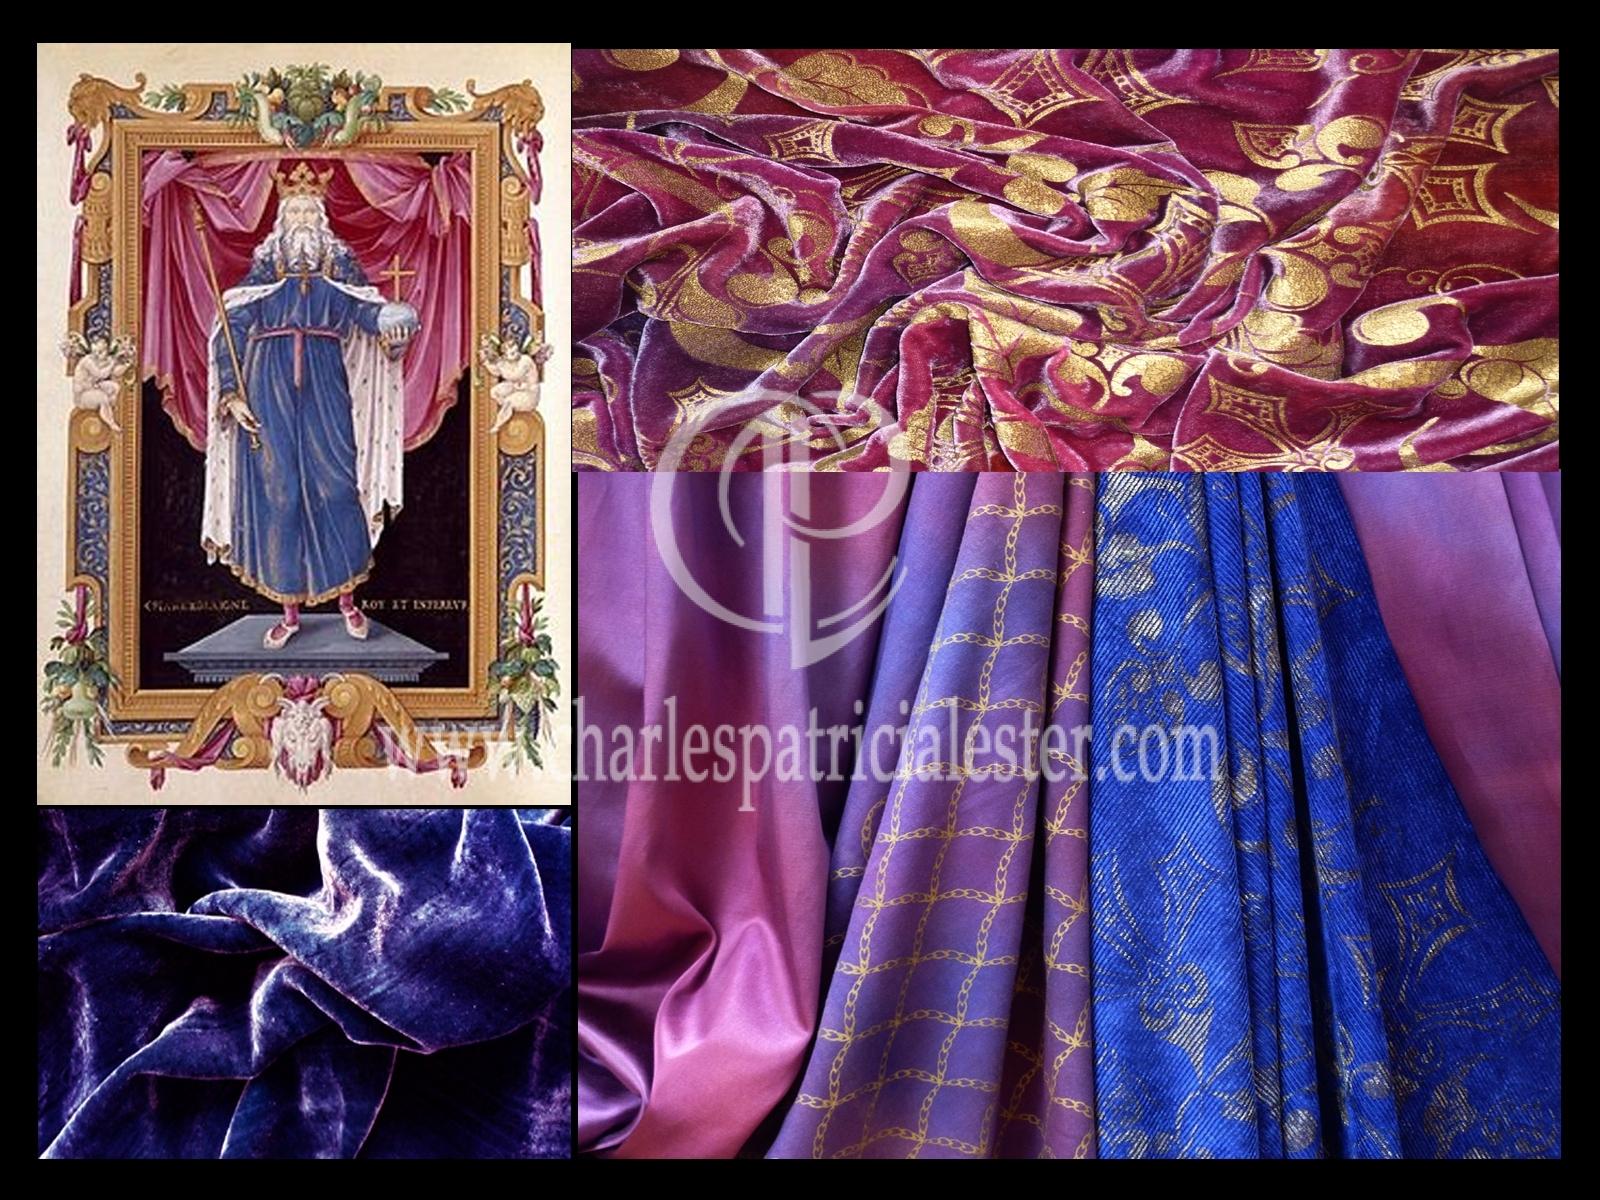 Medieval textiles